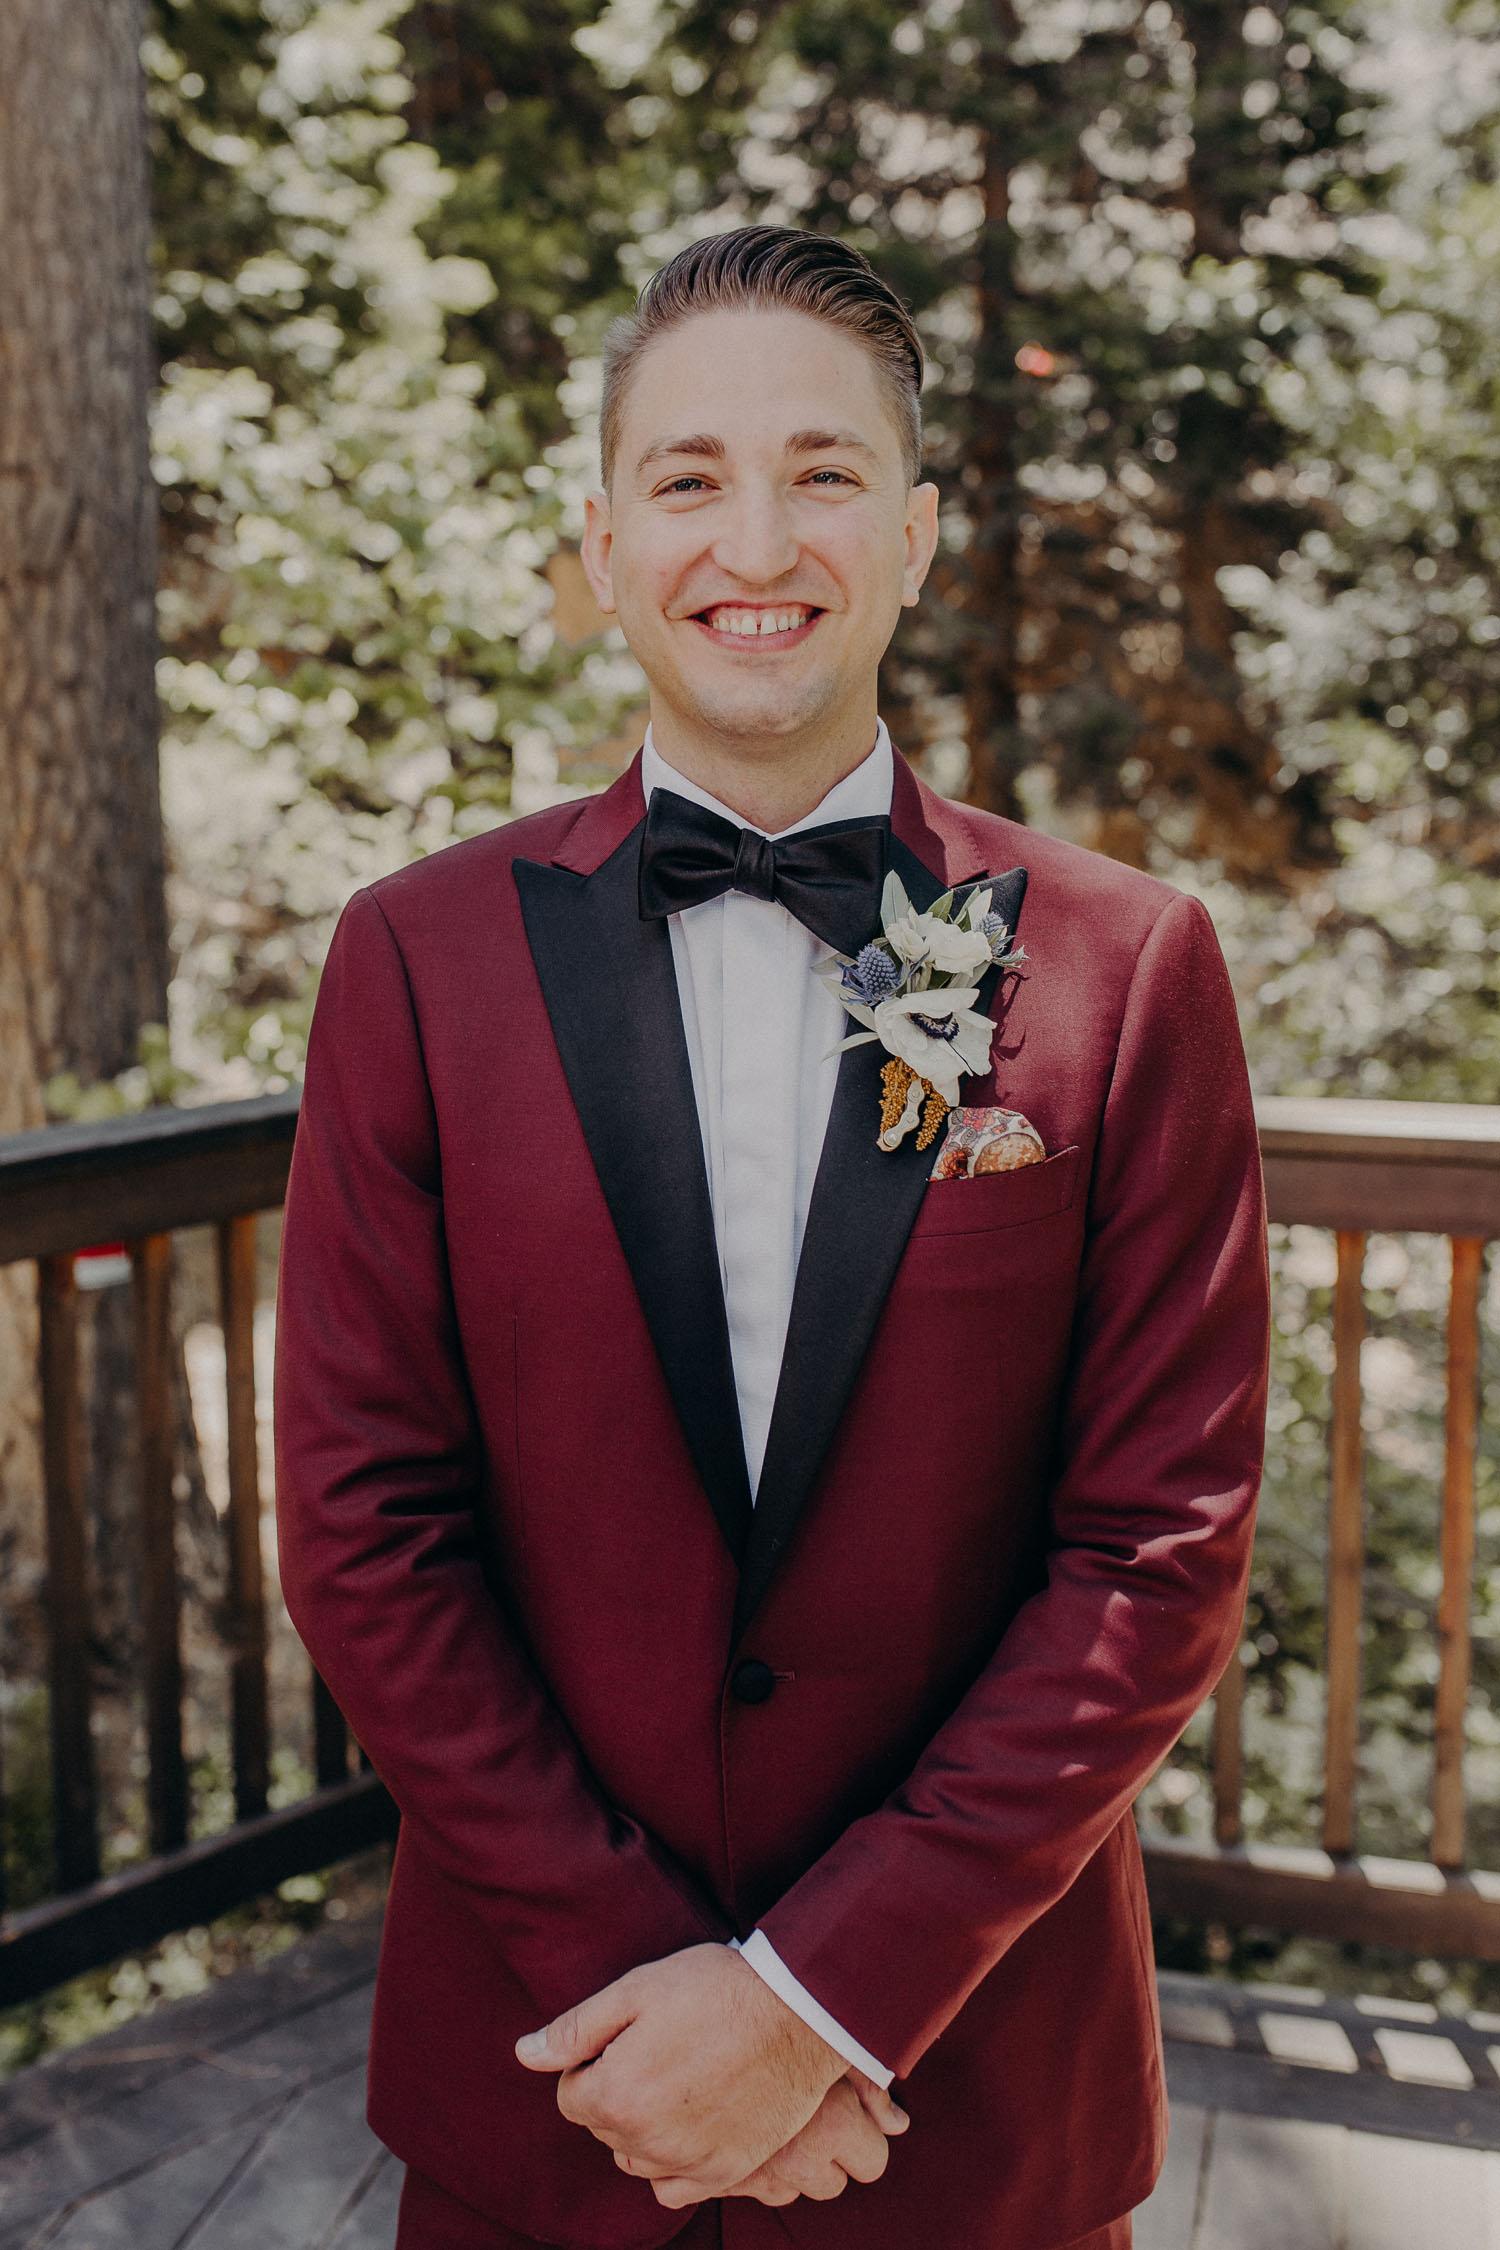 Red Suit Wedding Attire